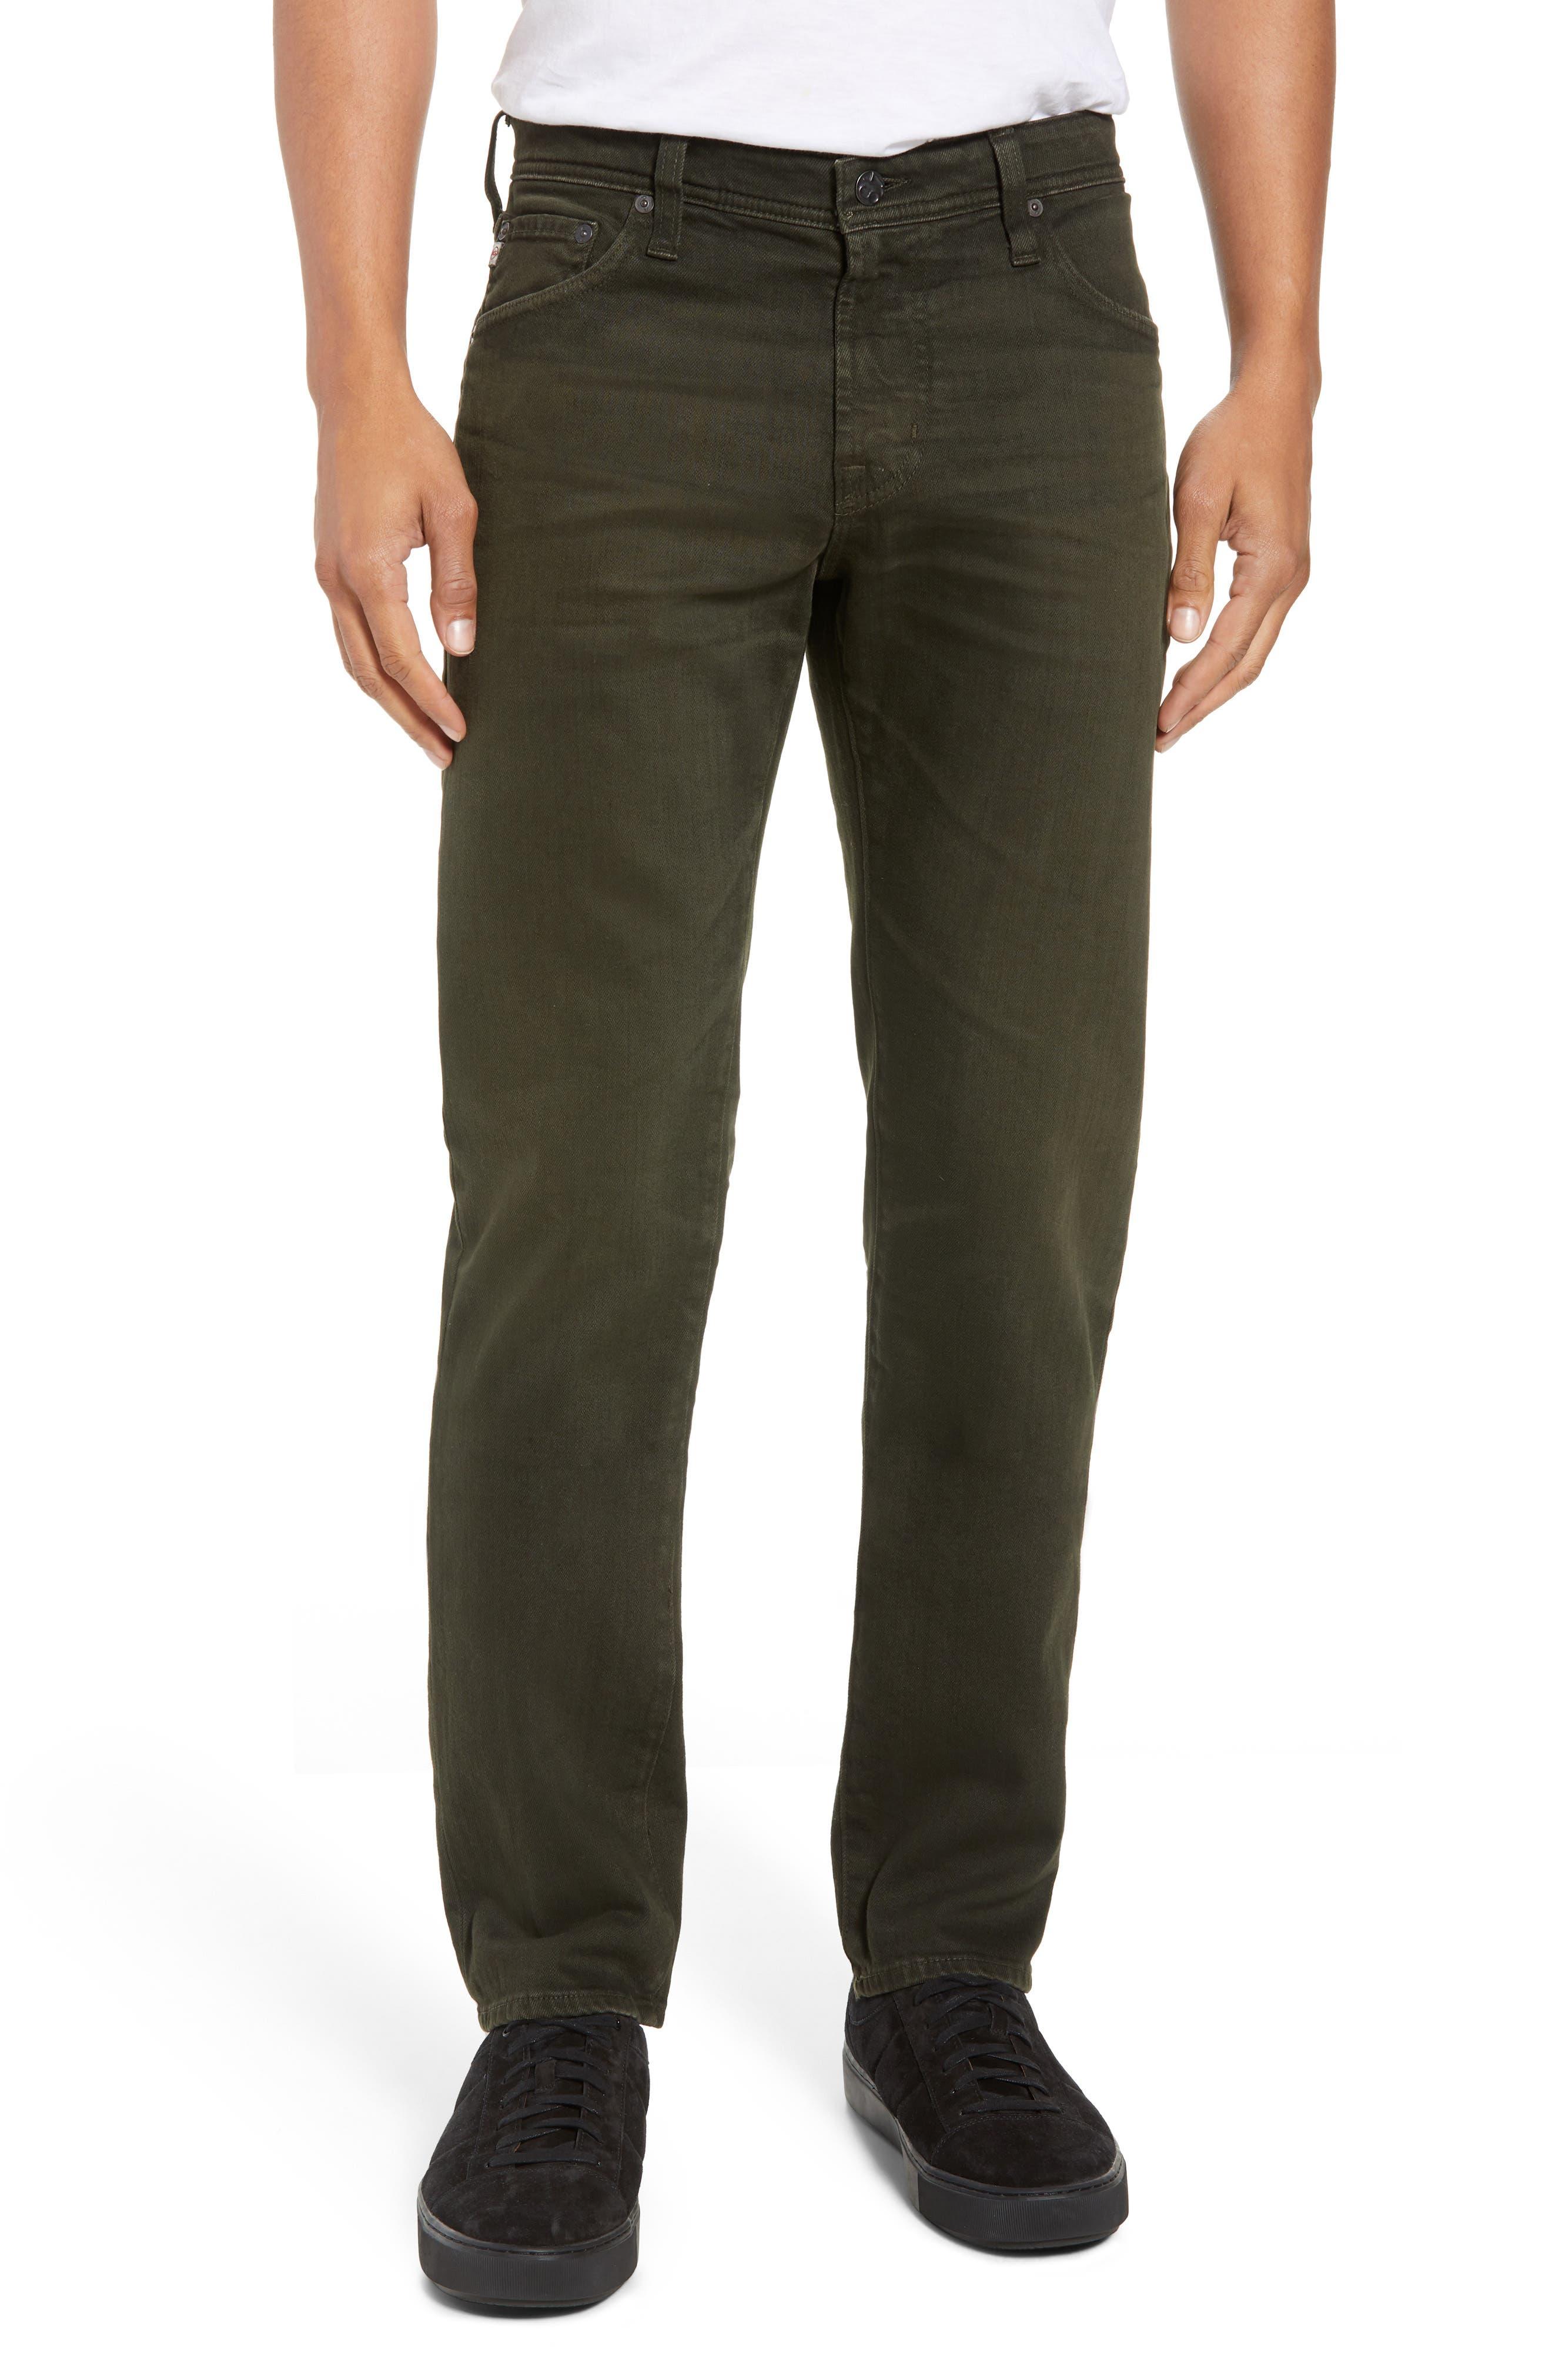 Tellis Slim Fit Jeans,                         Main,                         color, 7 YEARS OAK GROVE